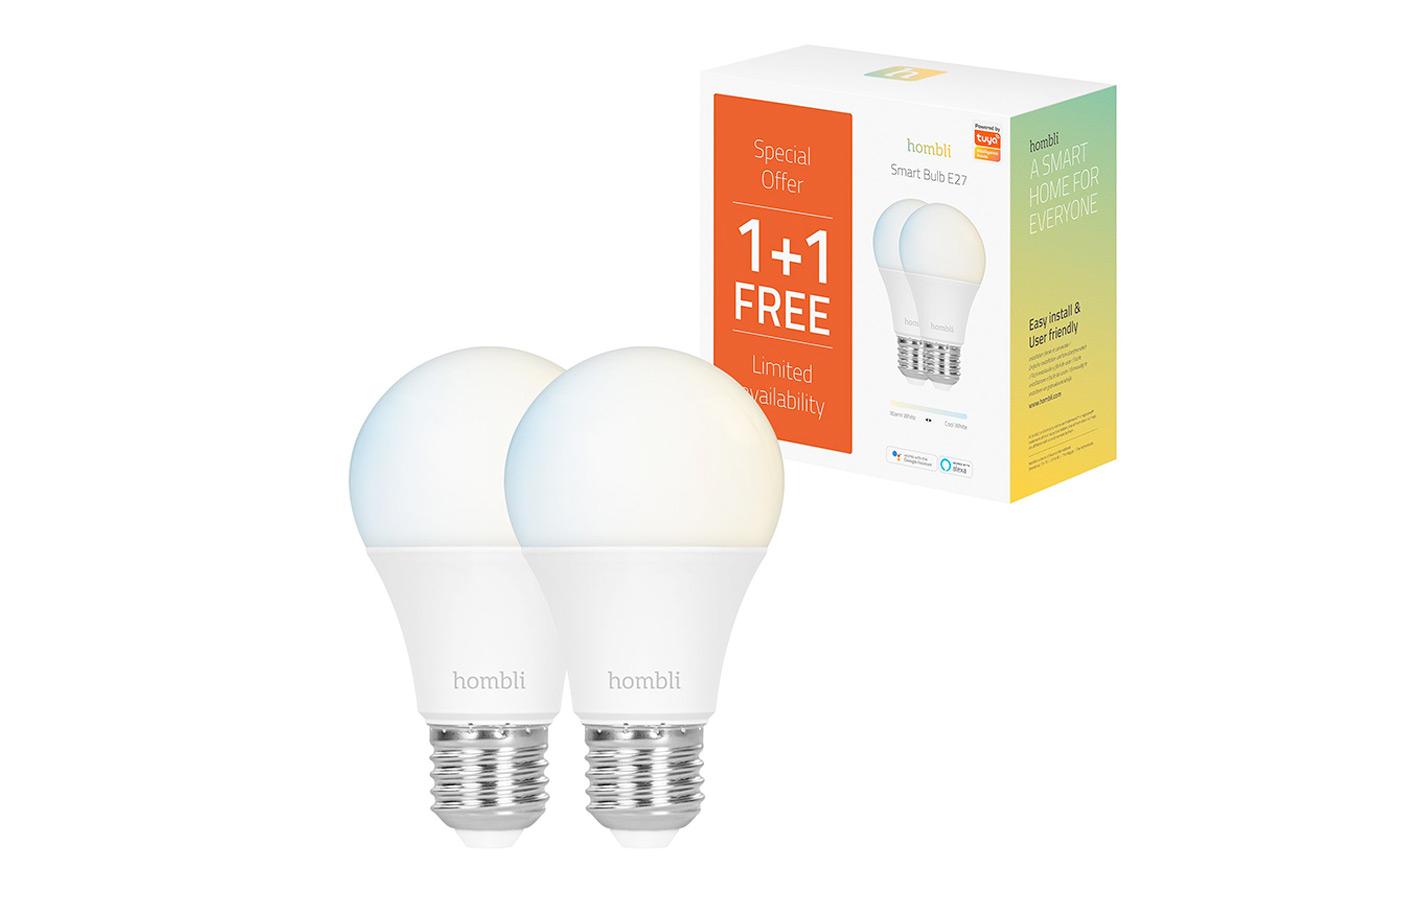 Hombli Slimme Lamp E27 9W WiFi 1 + 1 gratis!